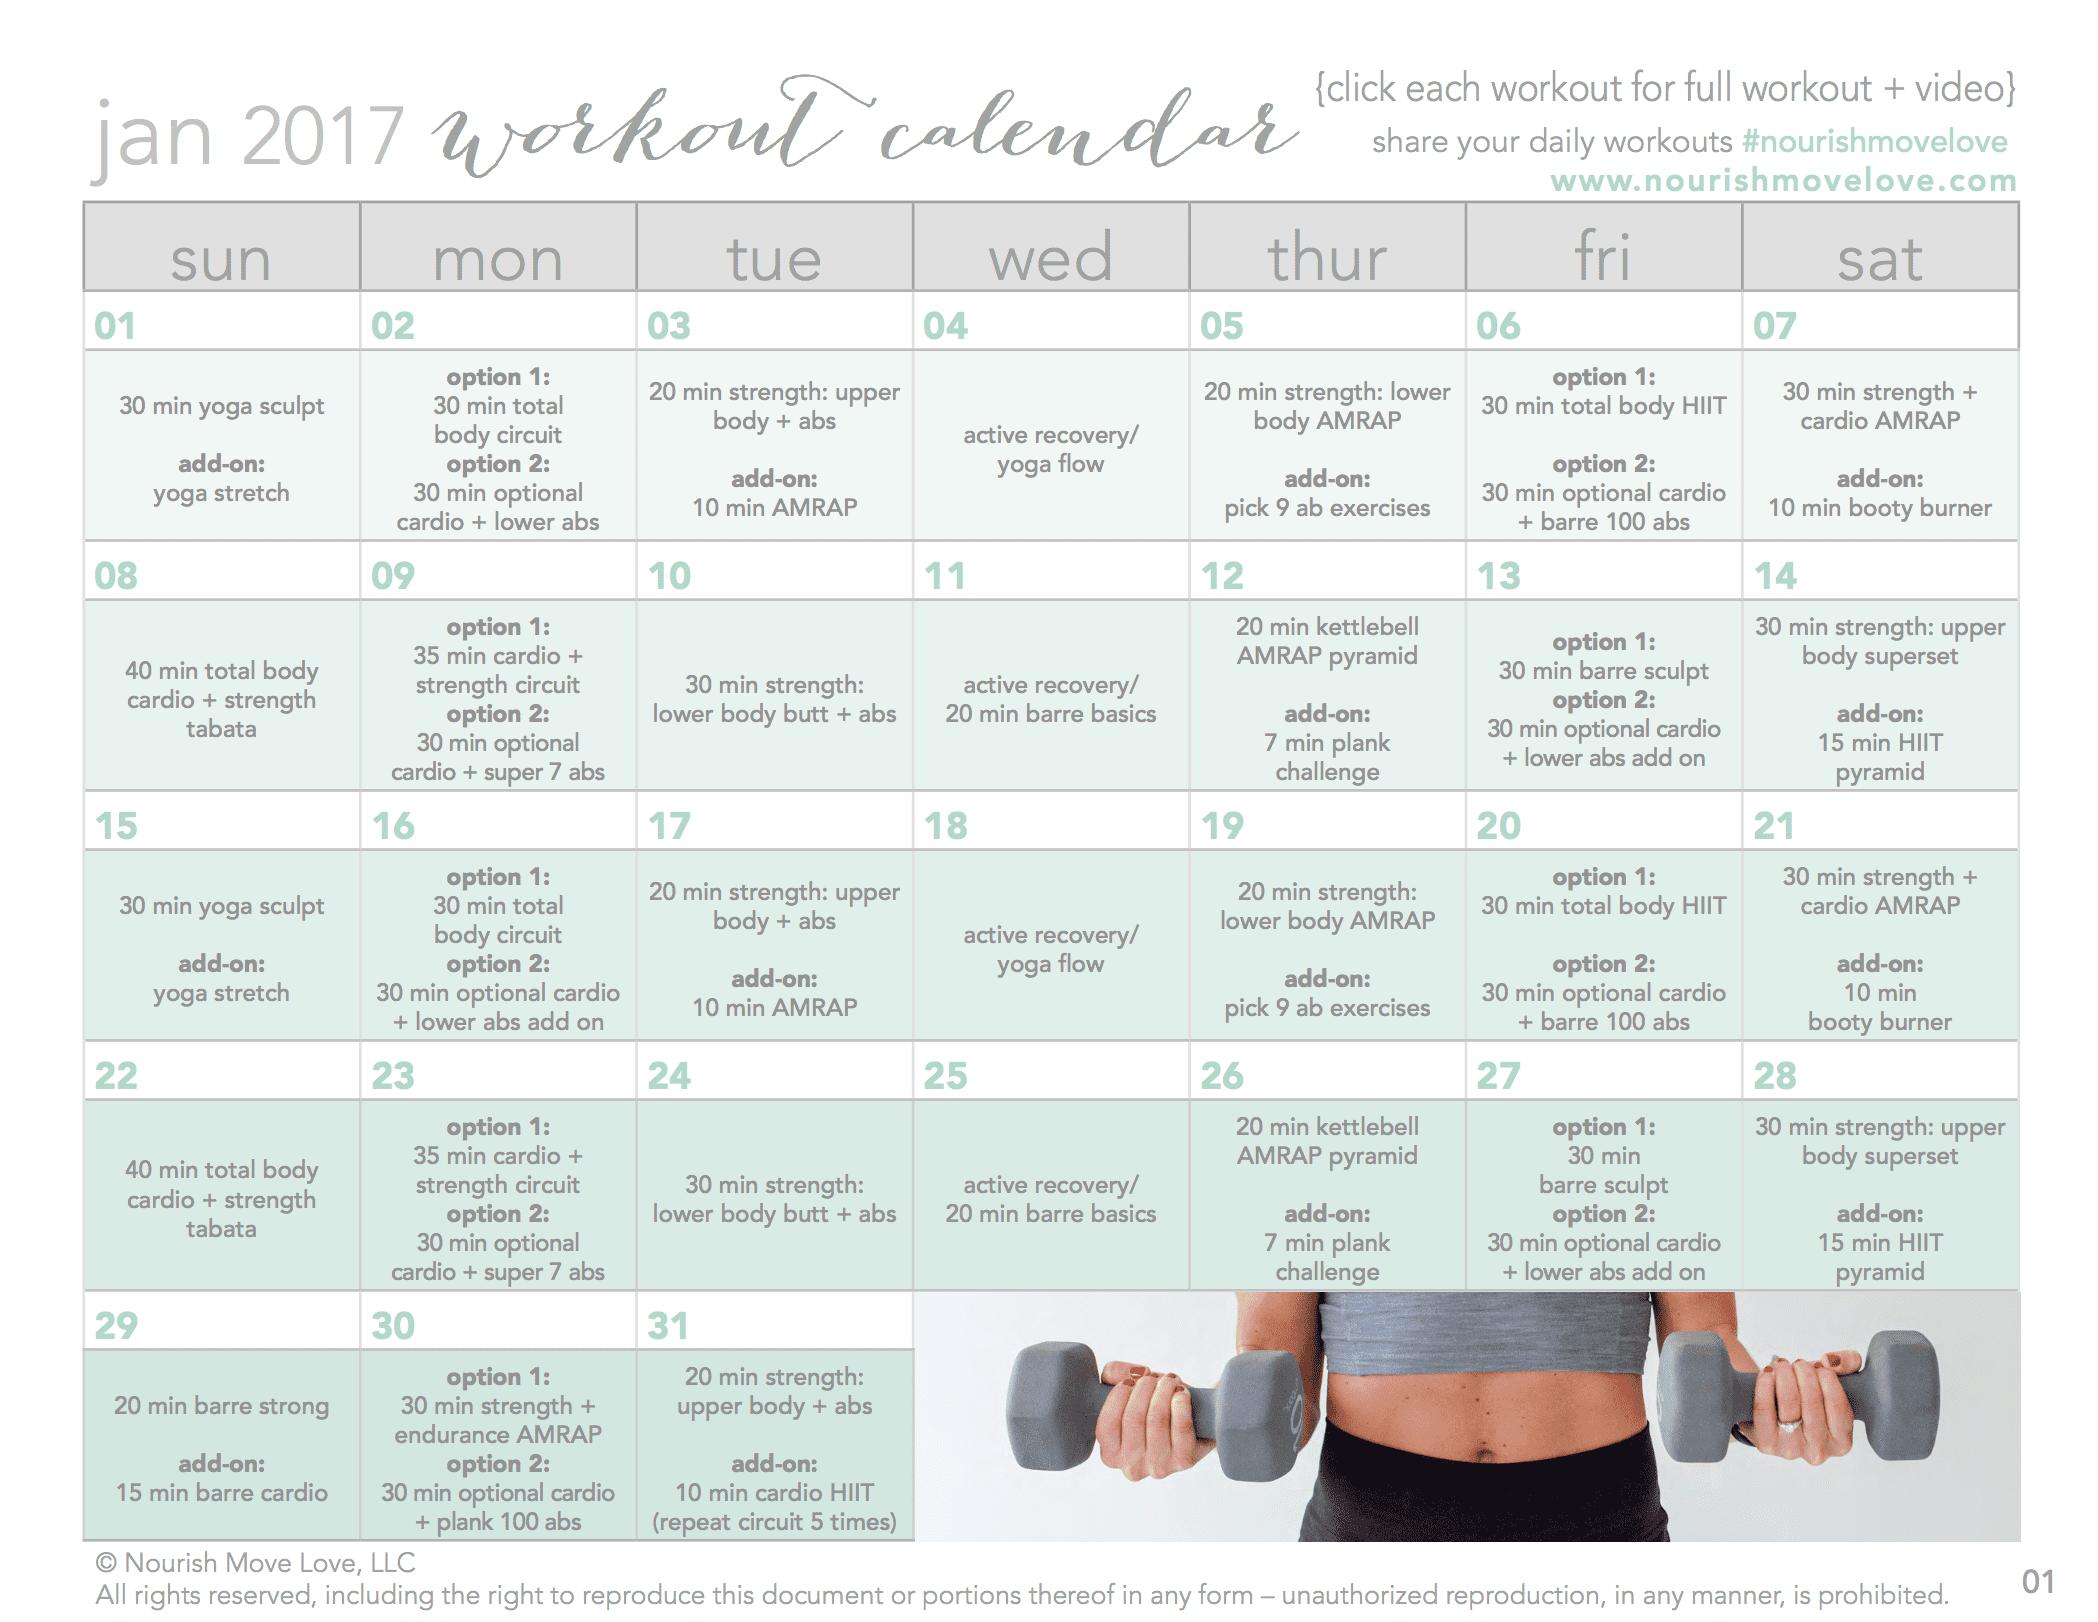 day workout calendar free workouts videos